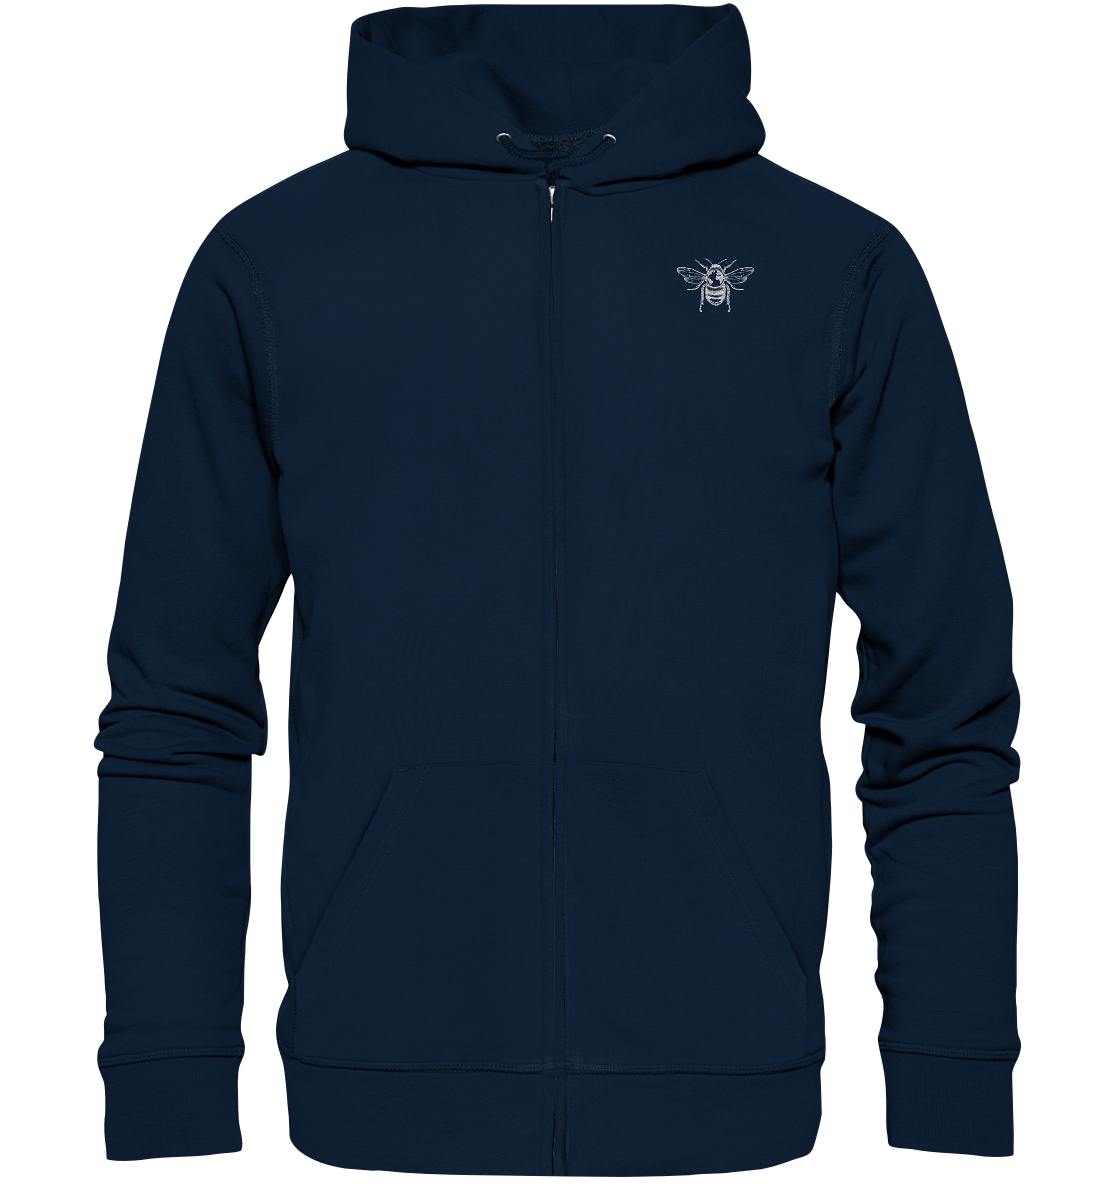 front-organic-zipper-0e2035-1116x.png